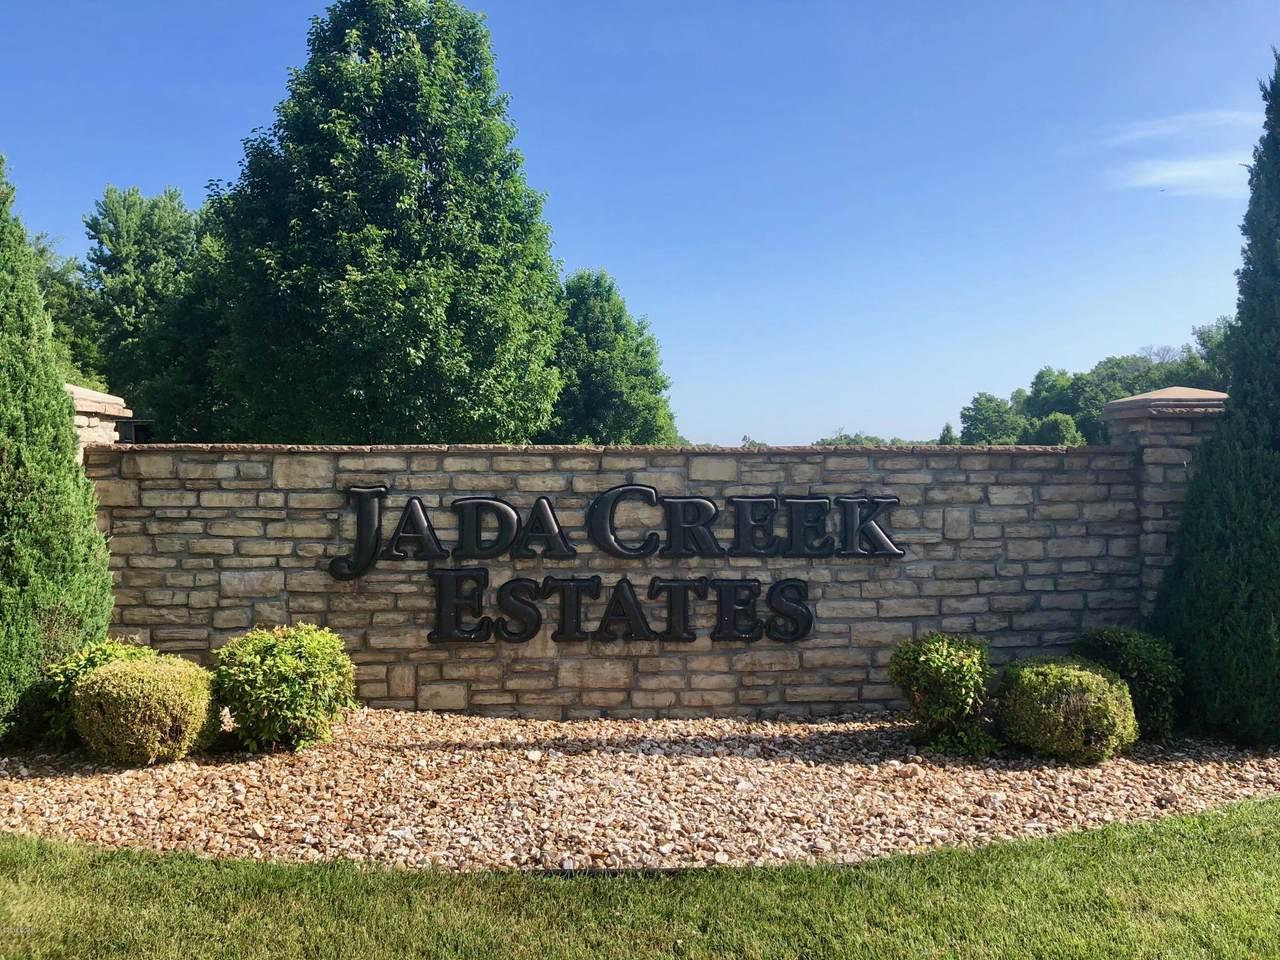 Lot 10 Jada Creek Estates - Photo 1